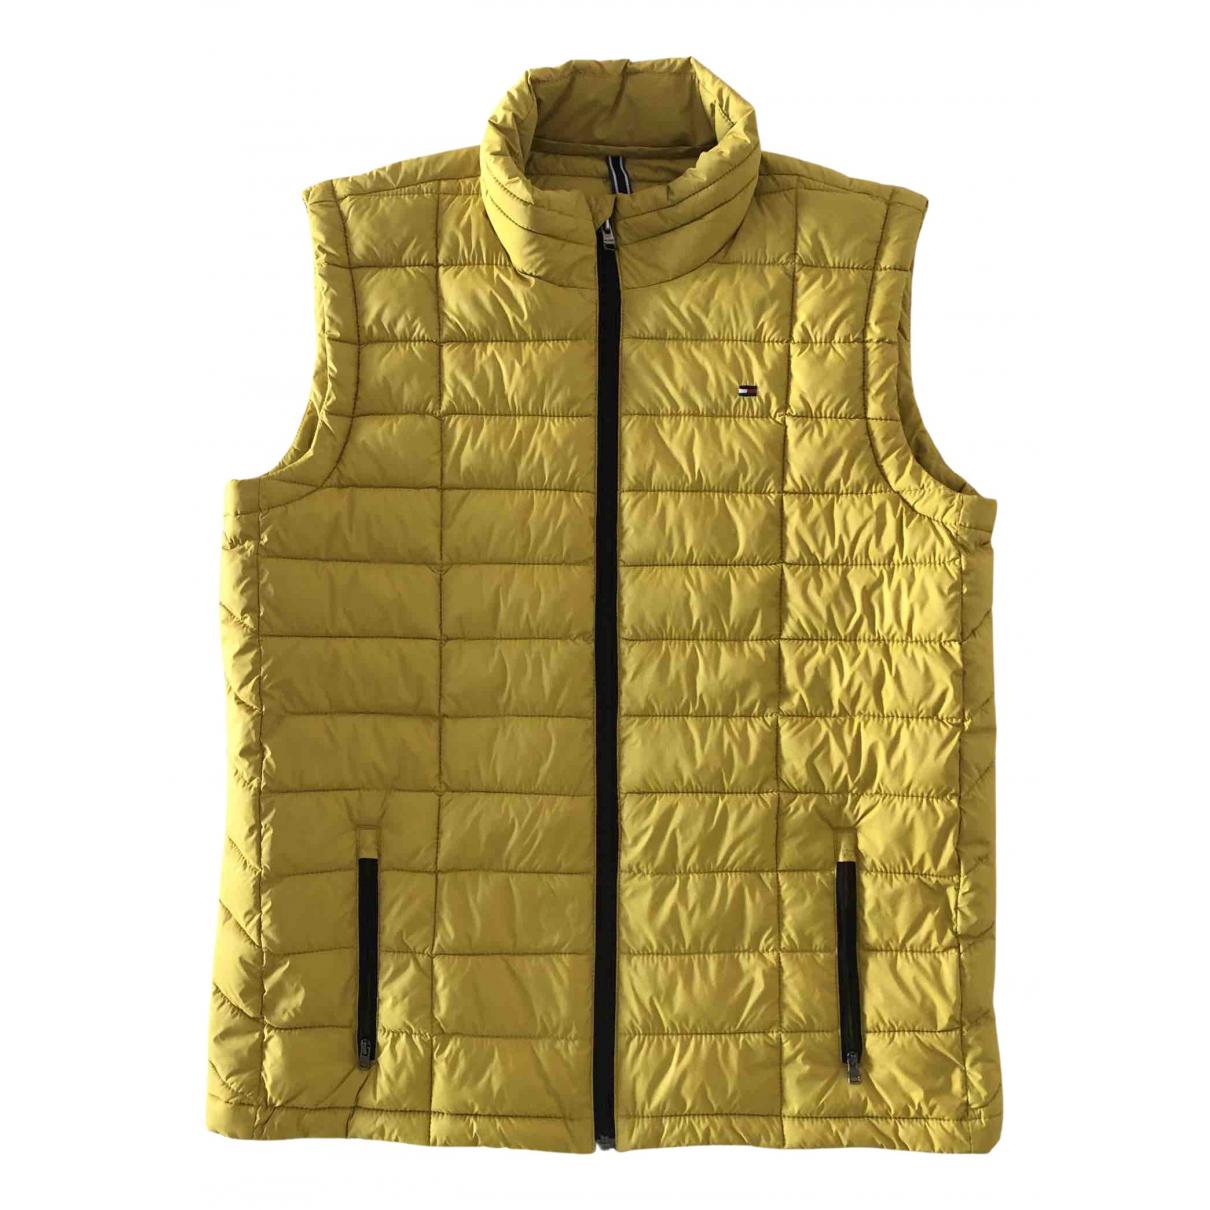 Tommy Hilfiger \N Jacke in  Gelb Polyester